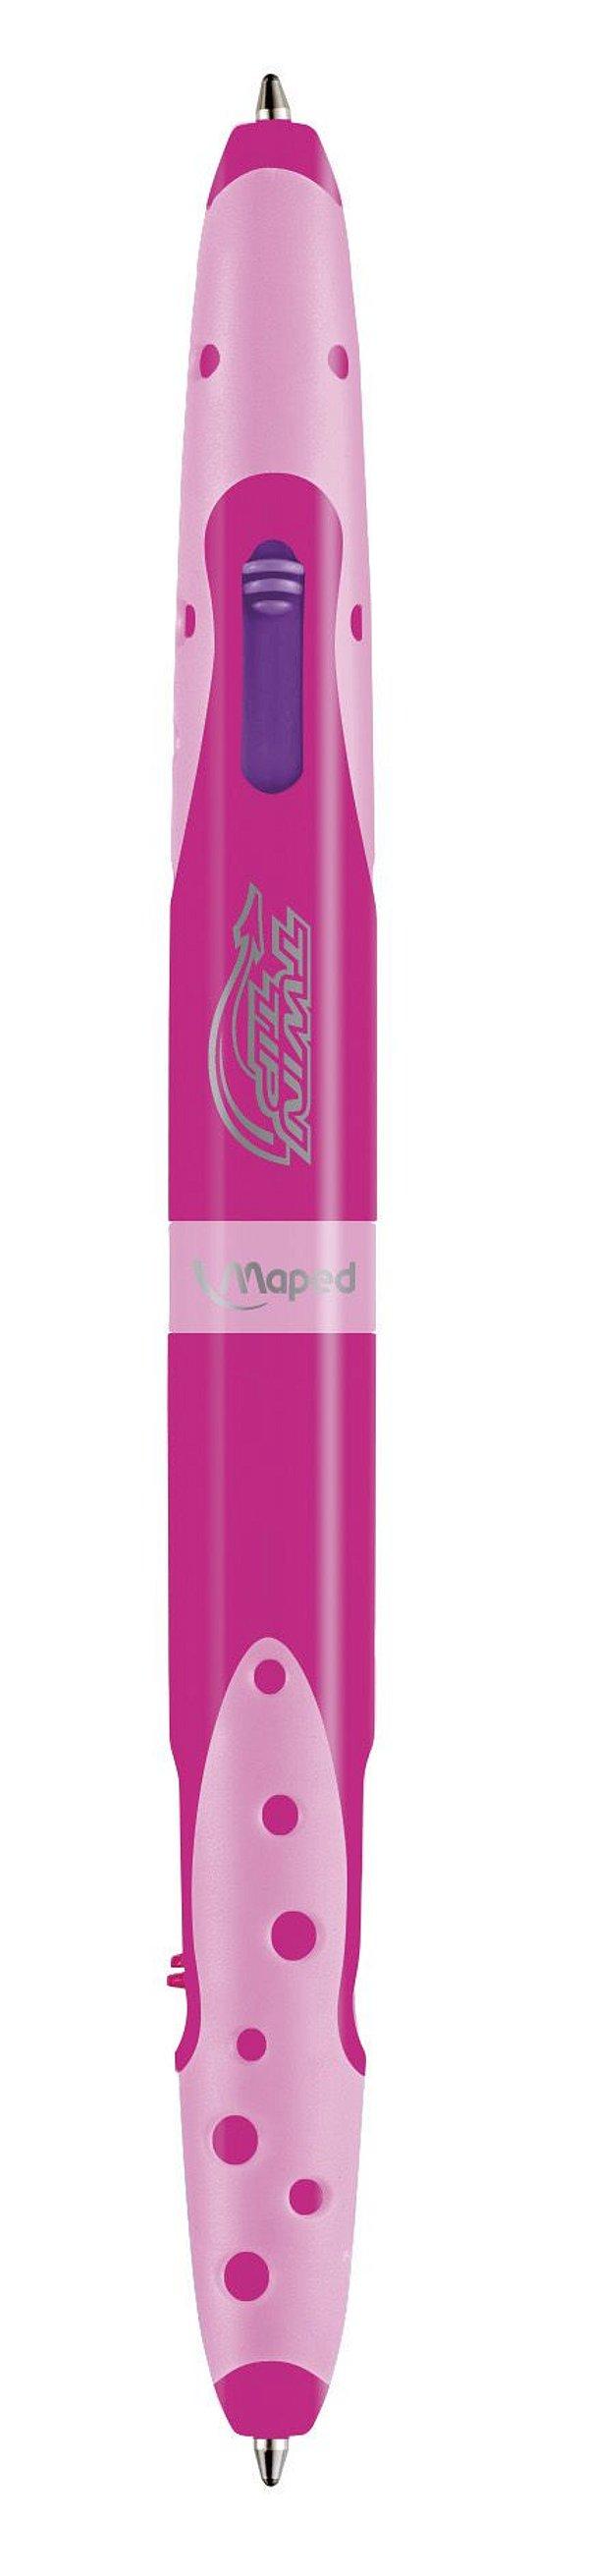 Caneta Twin Tip Pocket 4 Cores Corpo Rosa - Maped